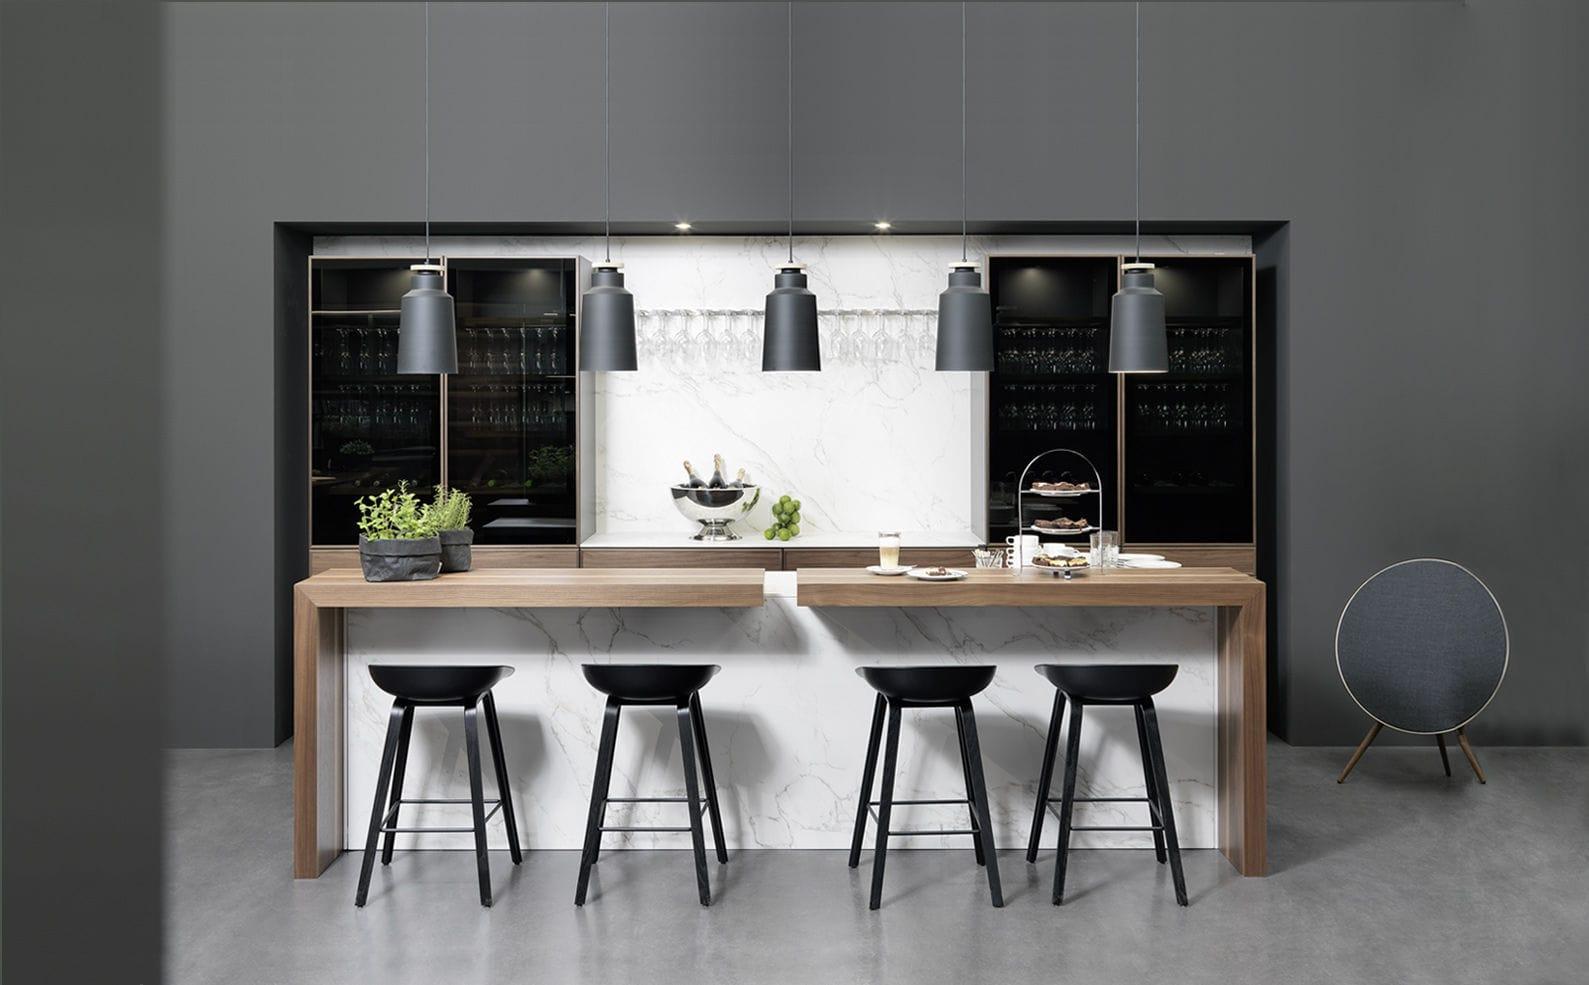 Bancone da bar / da cucina / in legno / dritto - CADRE - rational ...